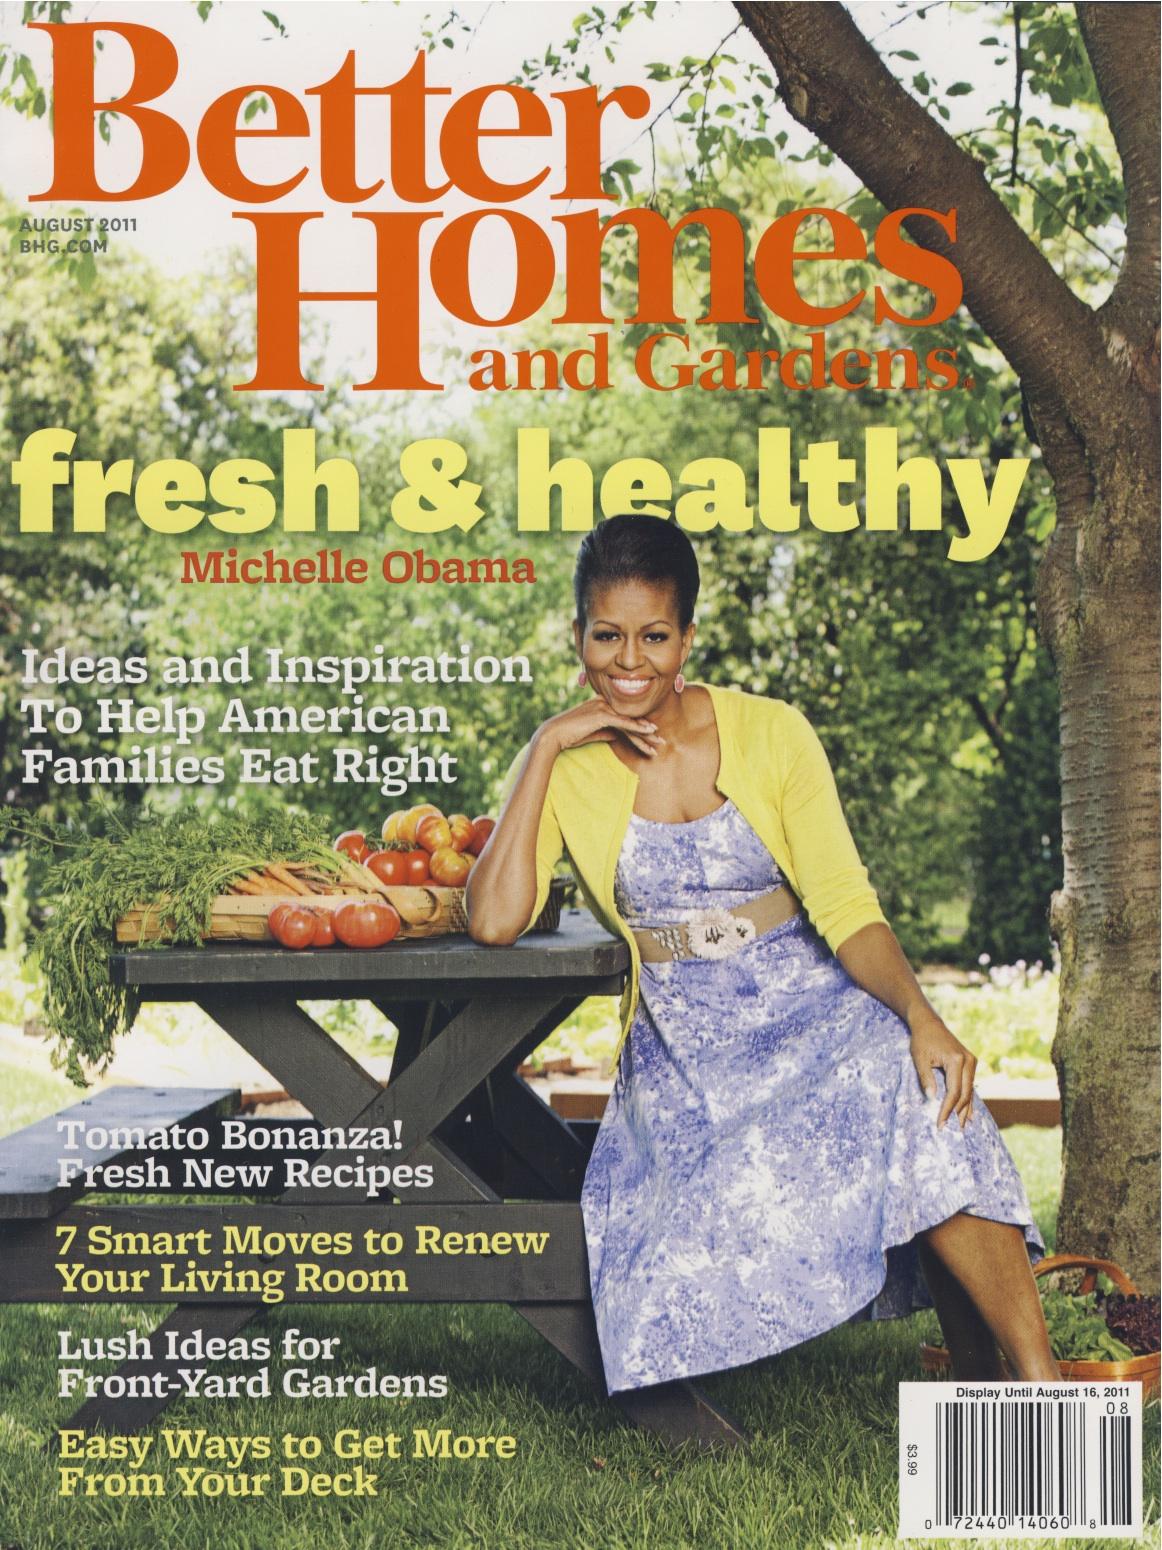 BHG Cover Aug 2011.jpg